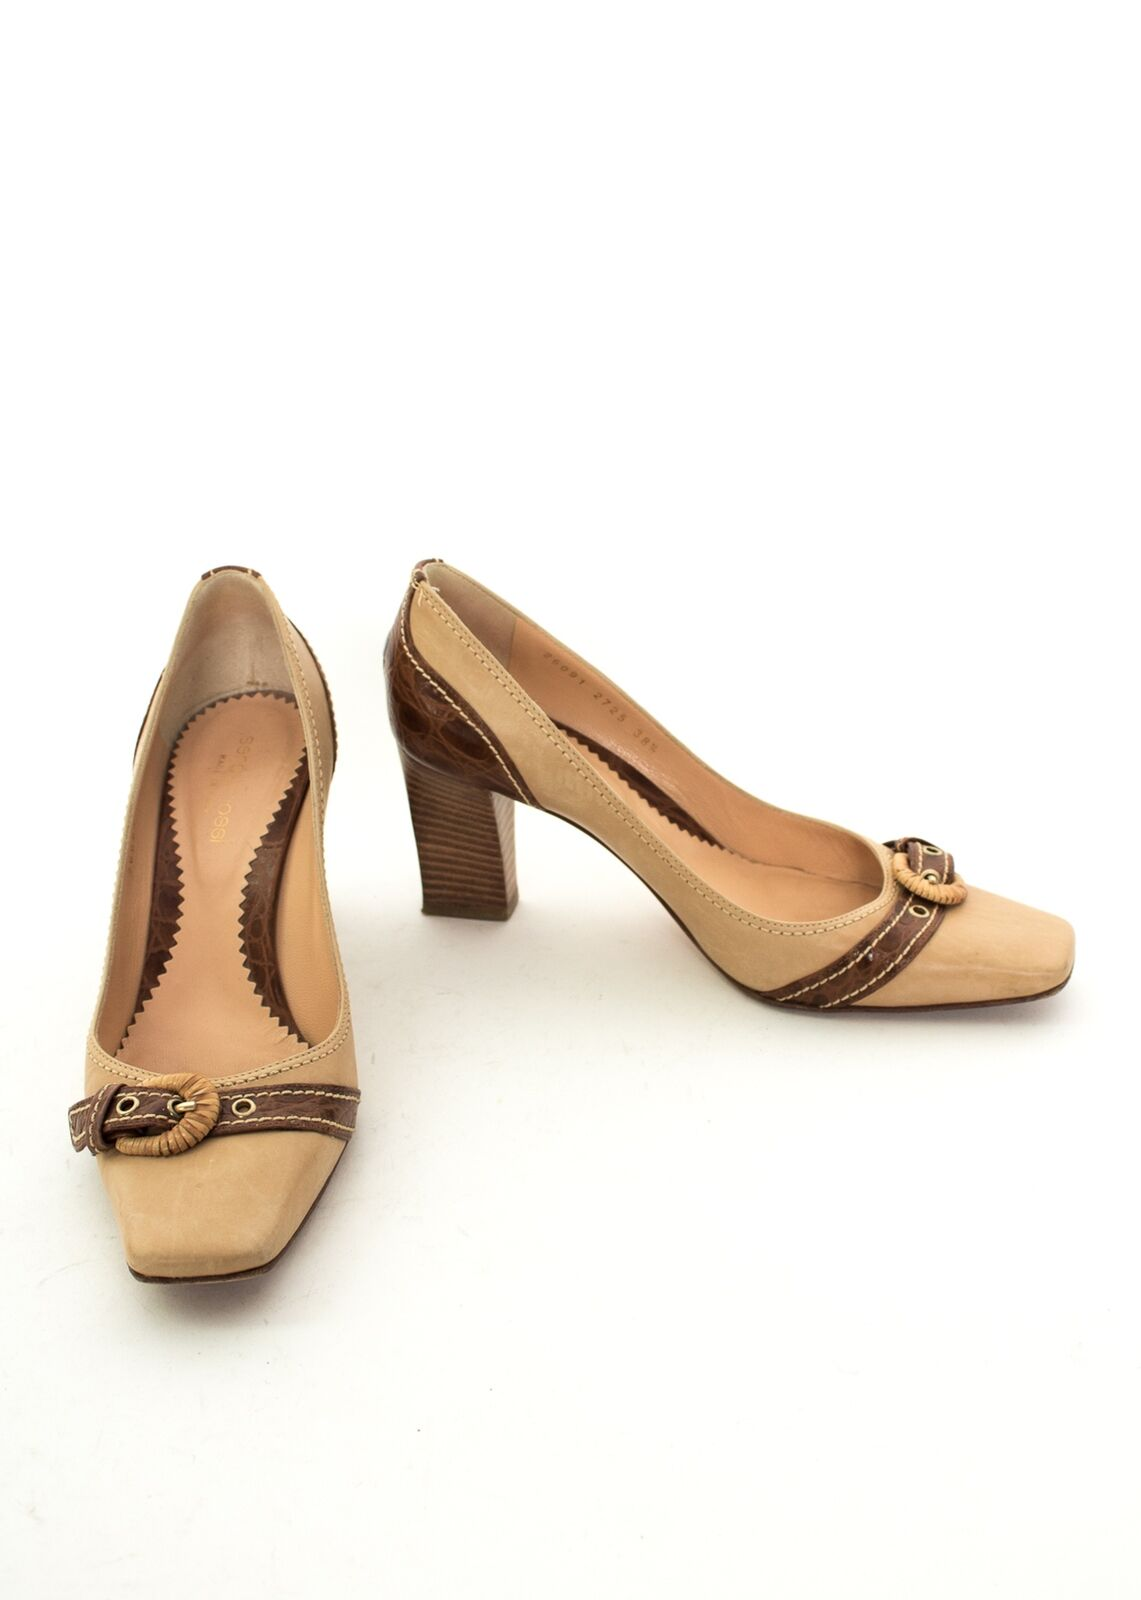 Descuento barato SERGIO ROSSI Pumps Gr. EU 38,5 Damen Schuhe High Heels Beige Leder